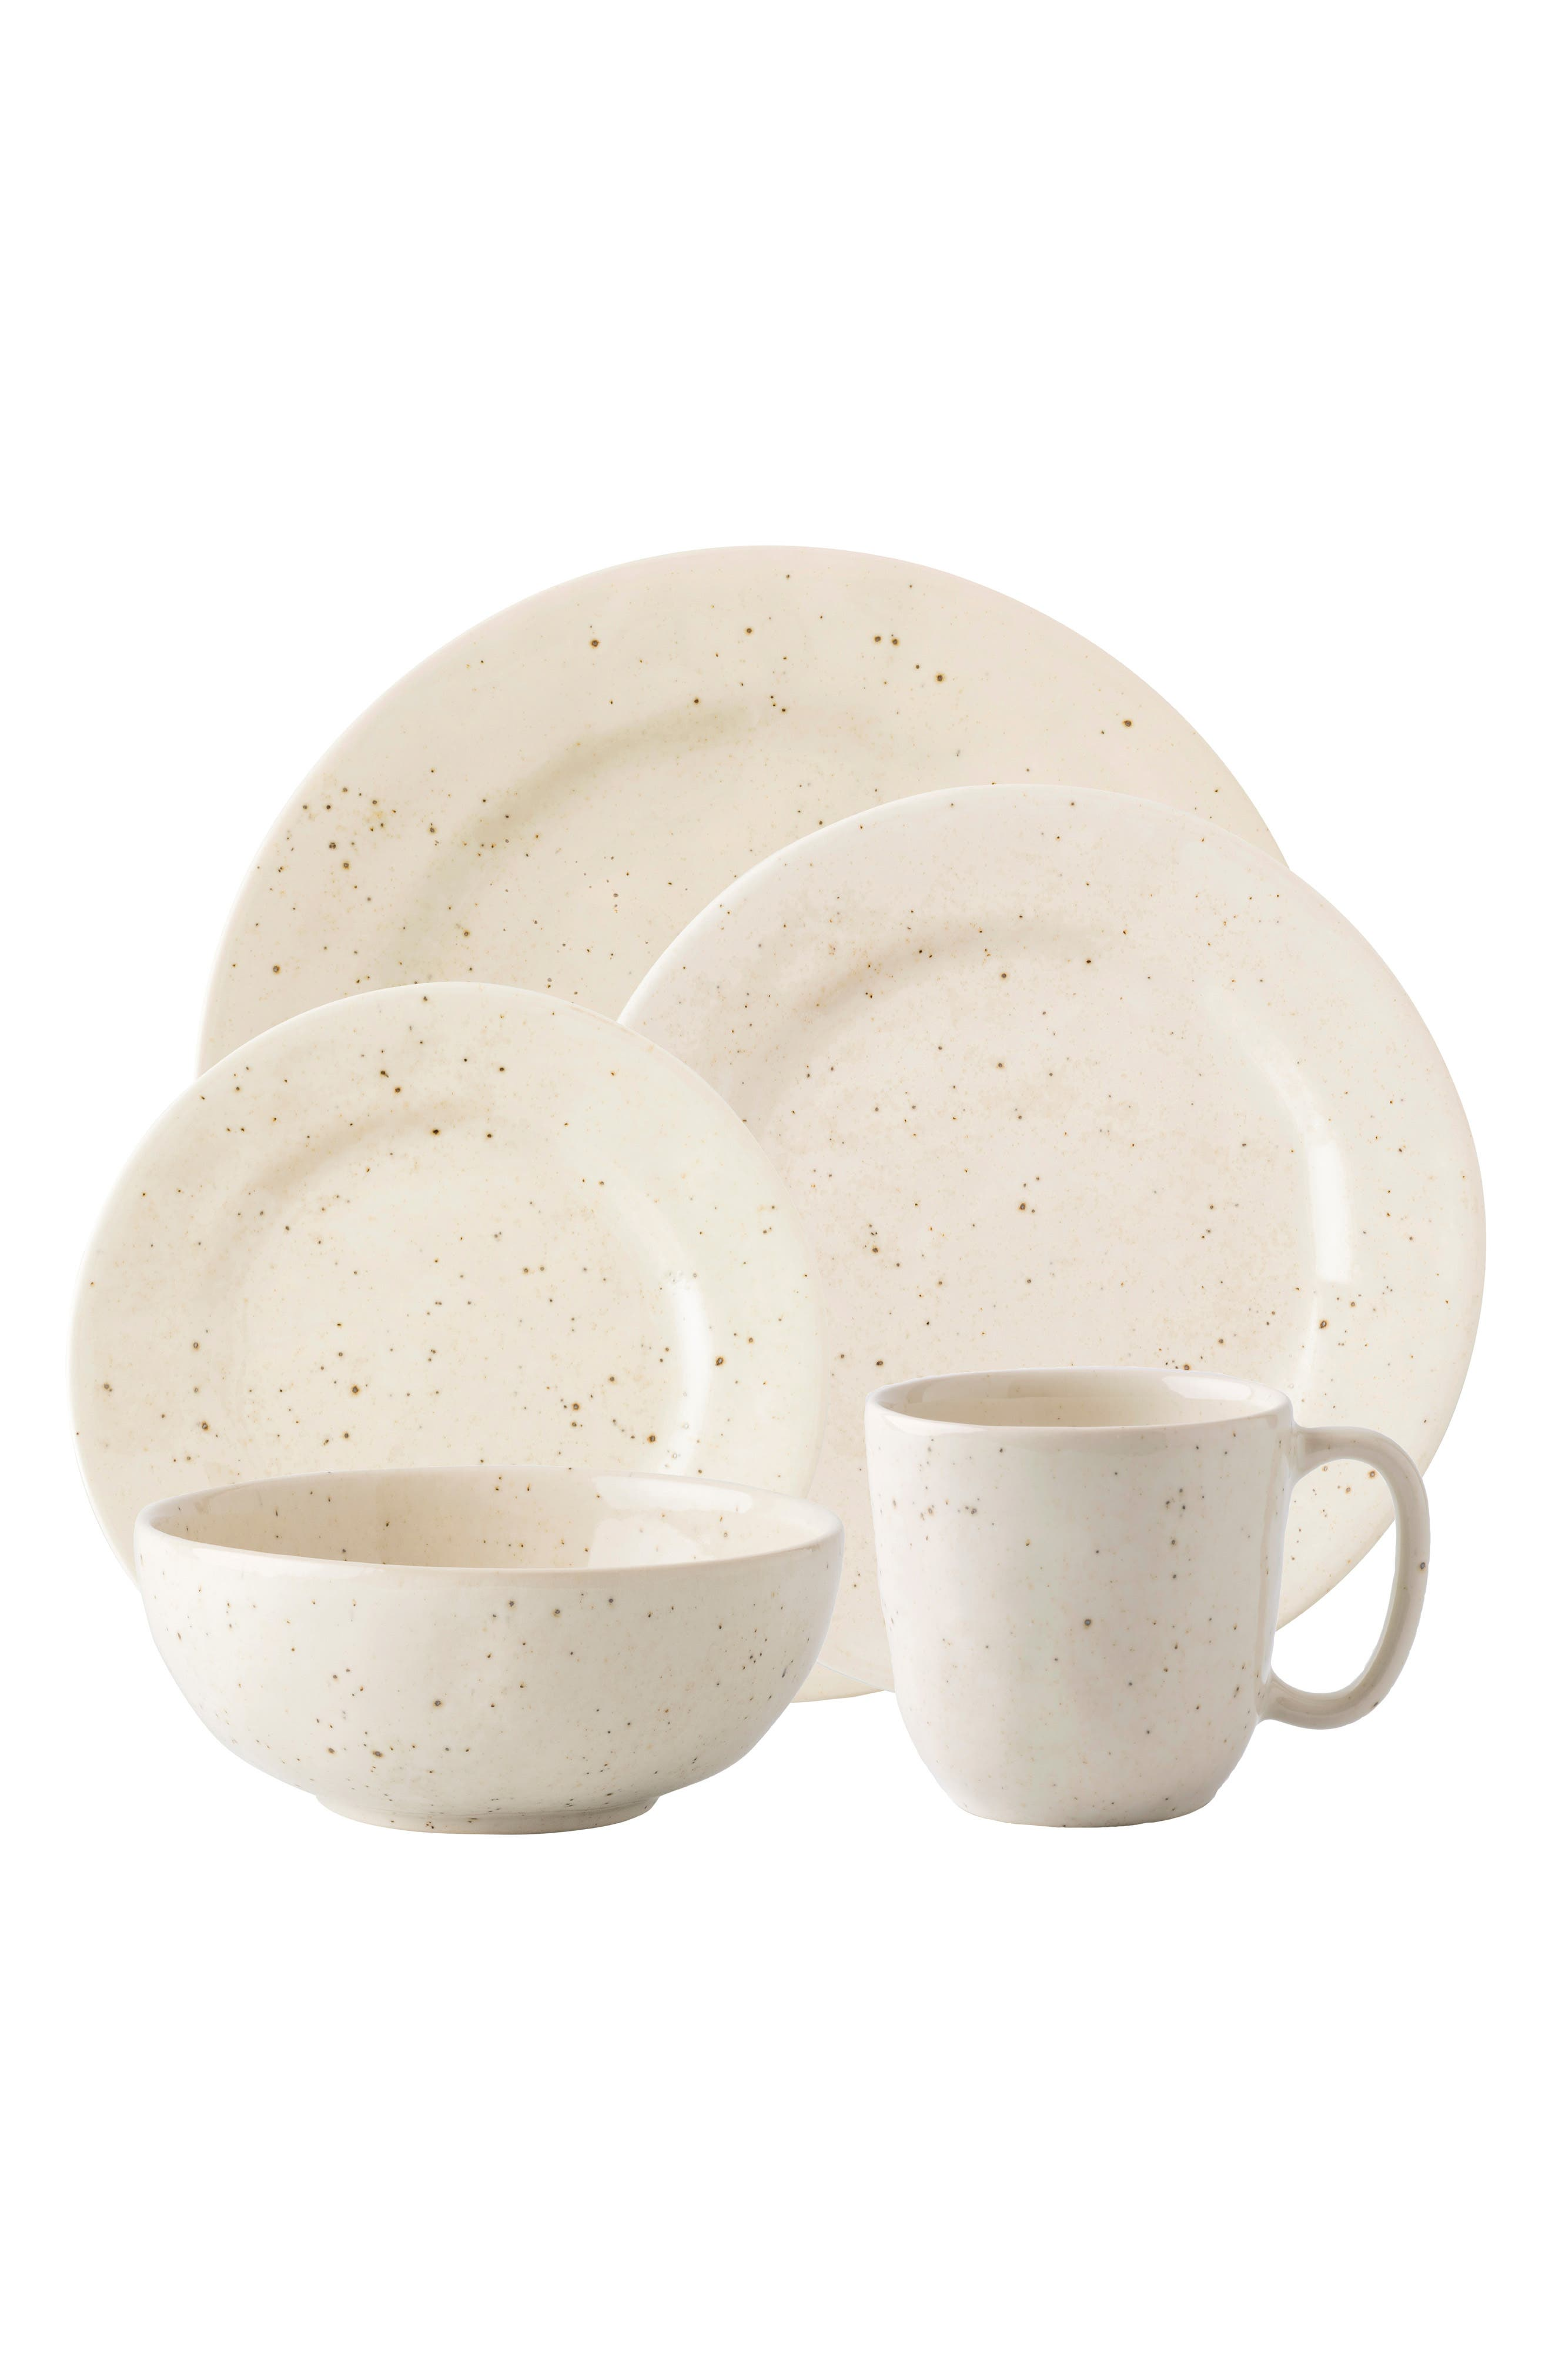 Puro 5-Piece Ceramic Place Setting,                         Main,                         color, VANILLA BEAN